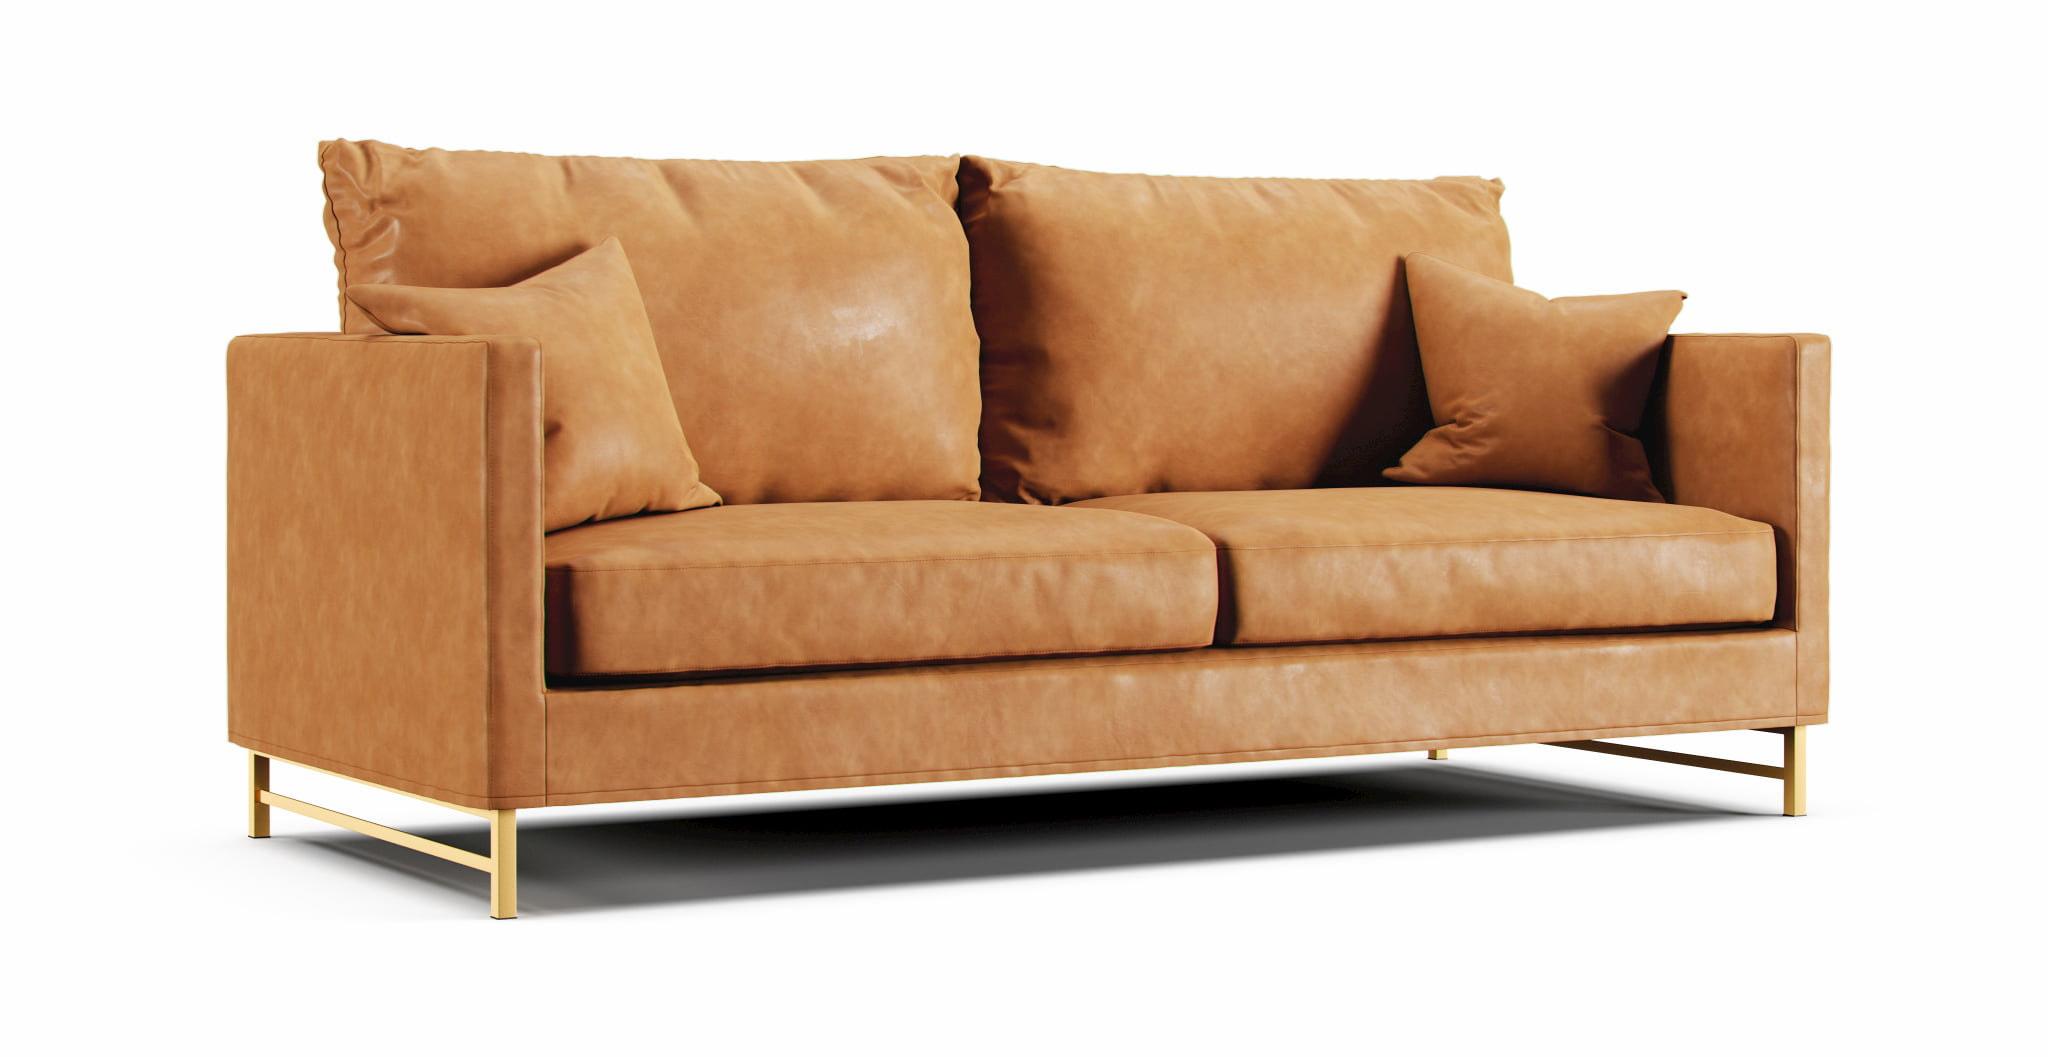 replacement arhaus sofa sectional